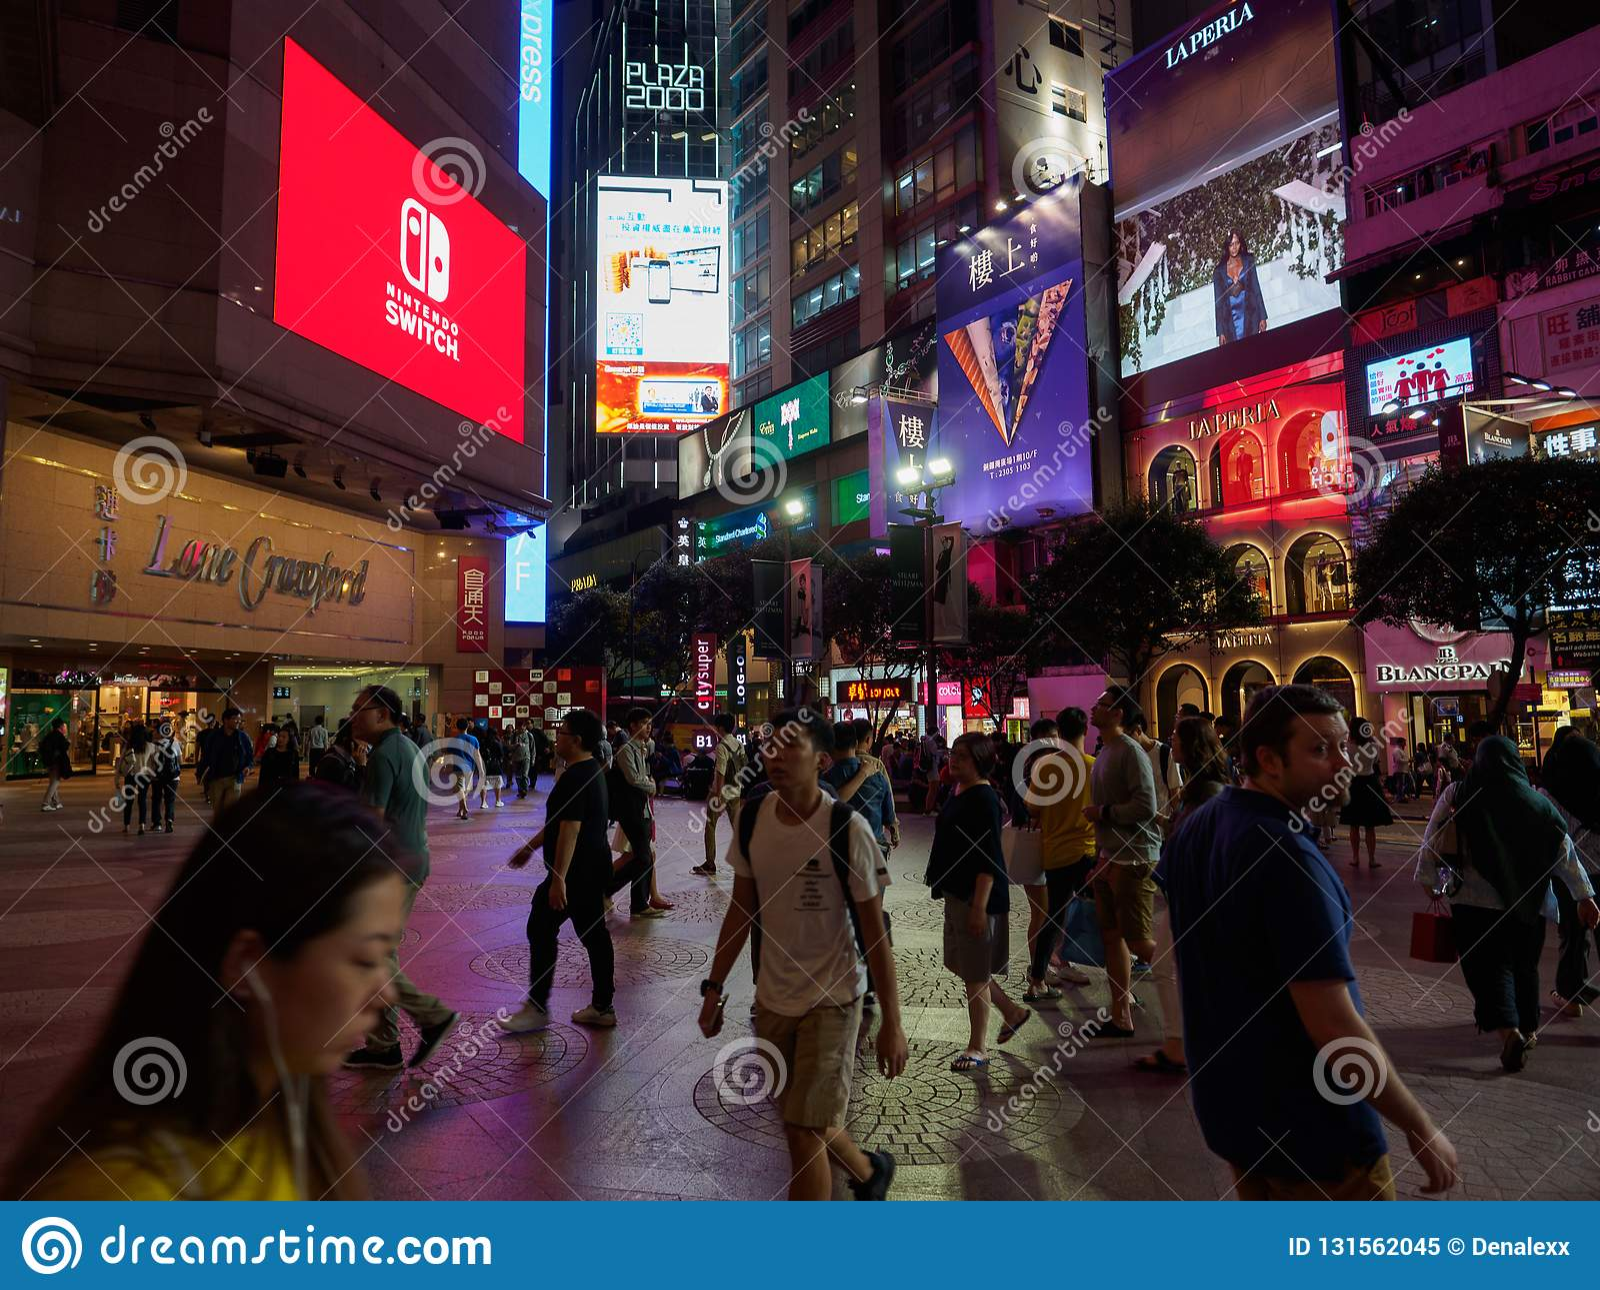 A photo taken near the Times Square shopping center near Russel street Hong Kong